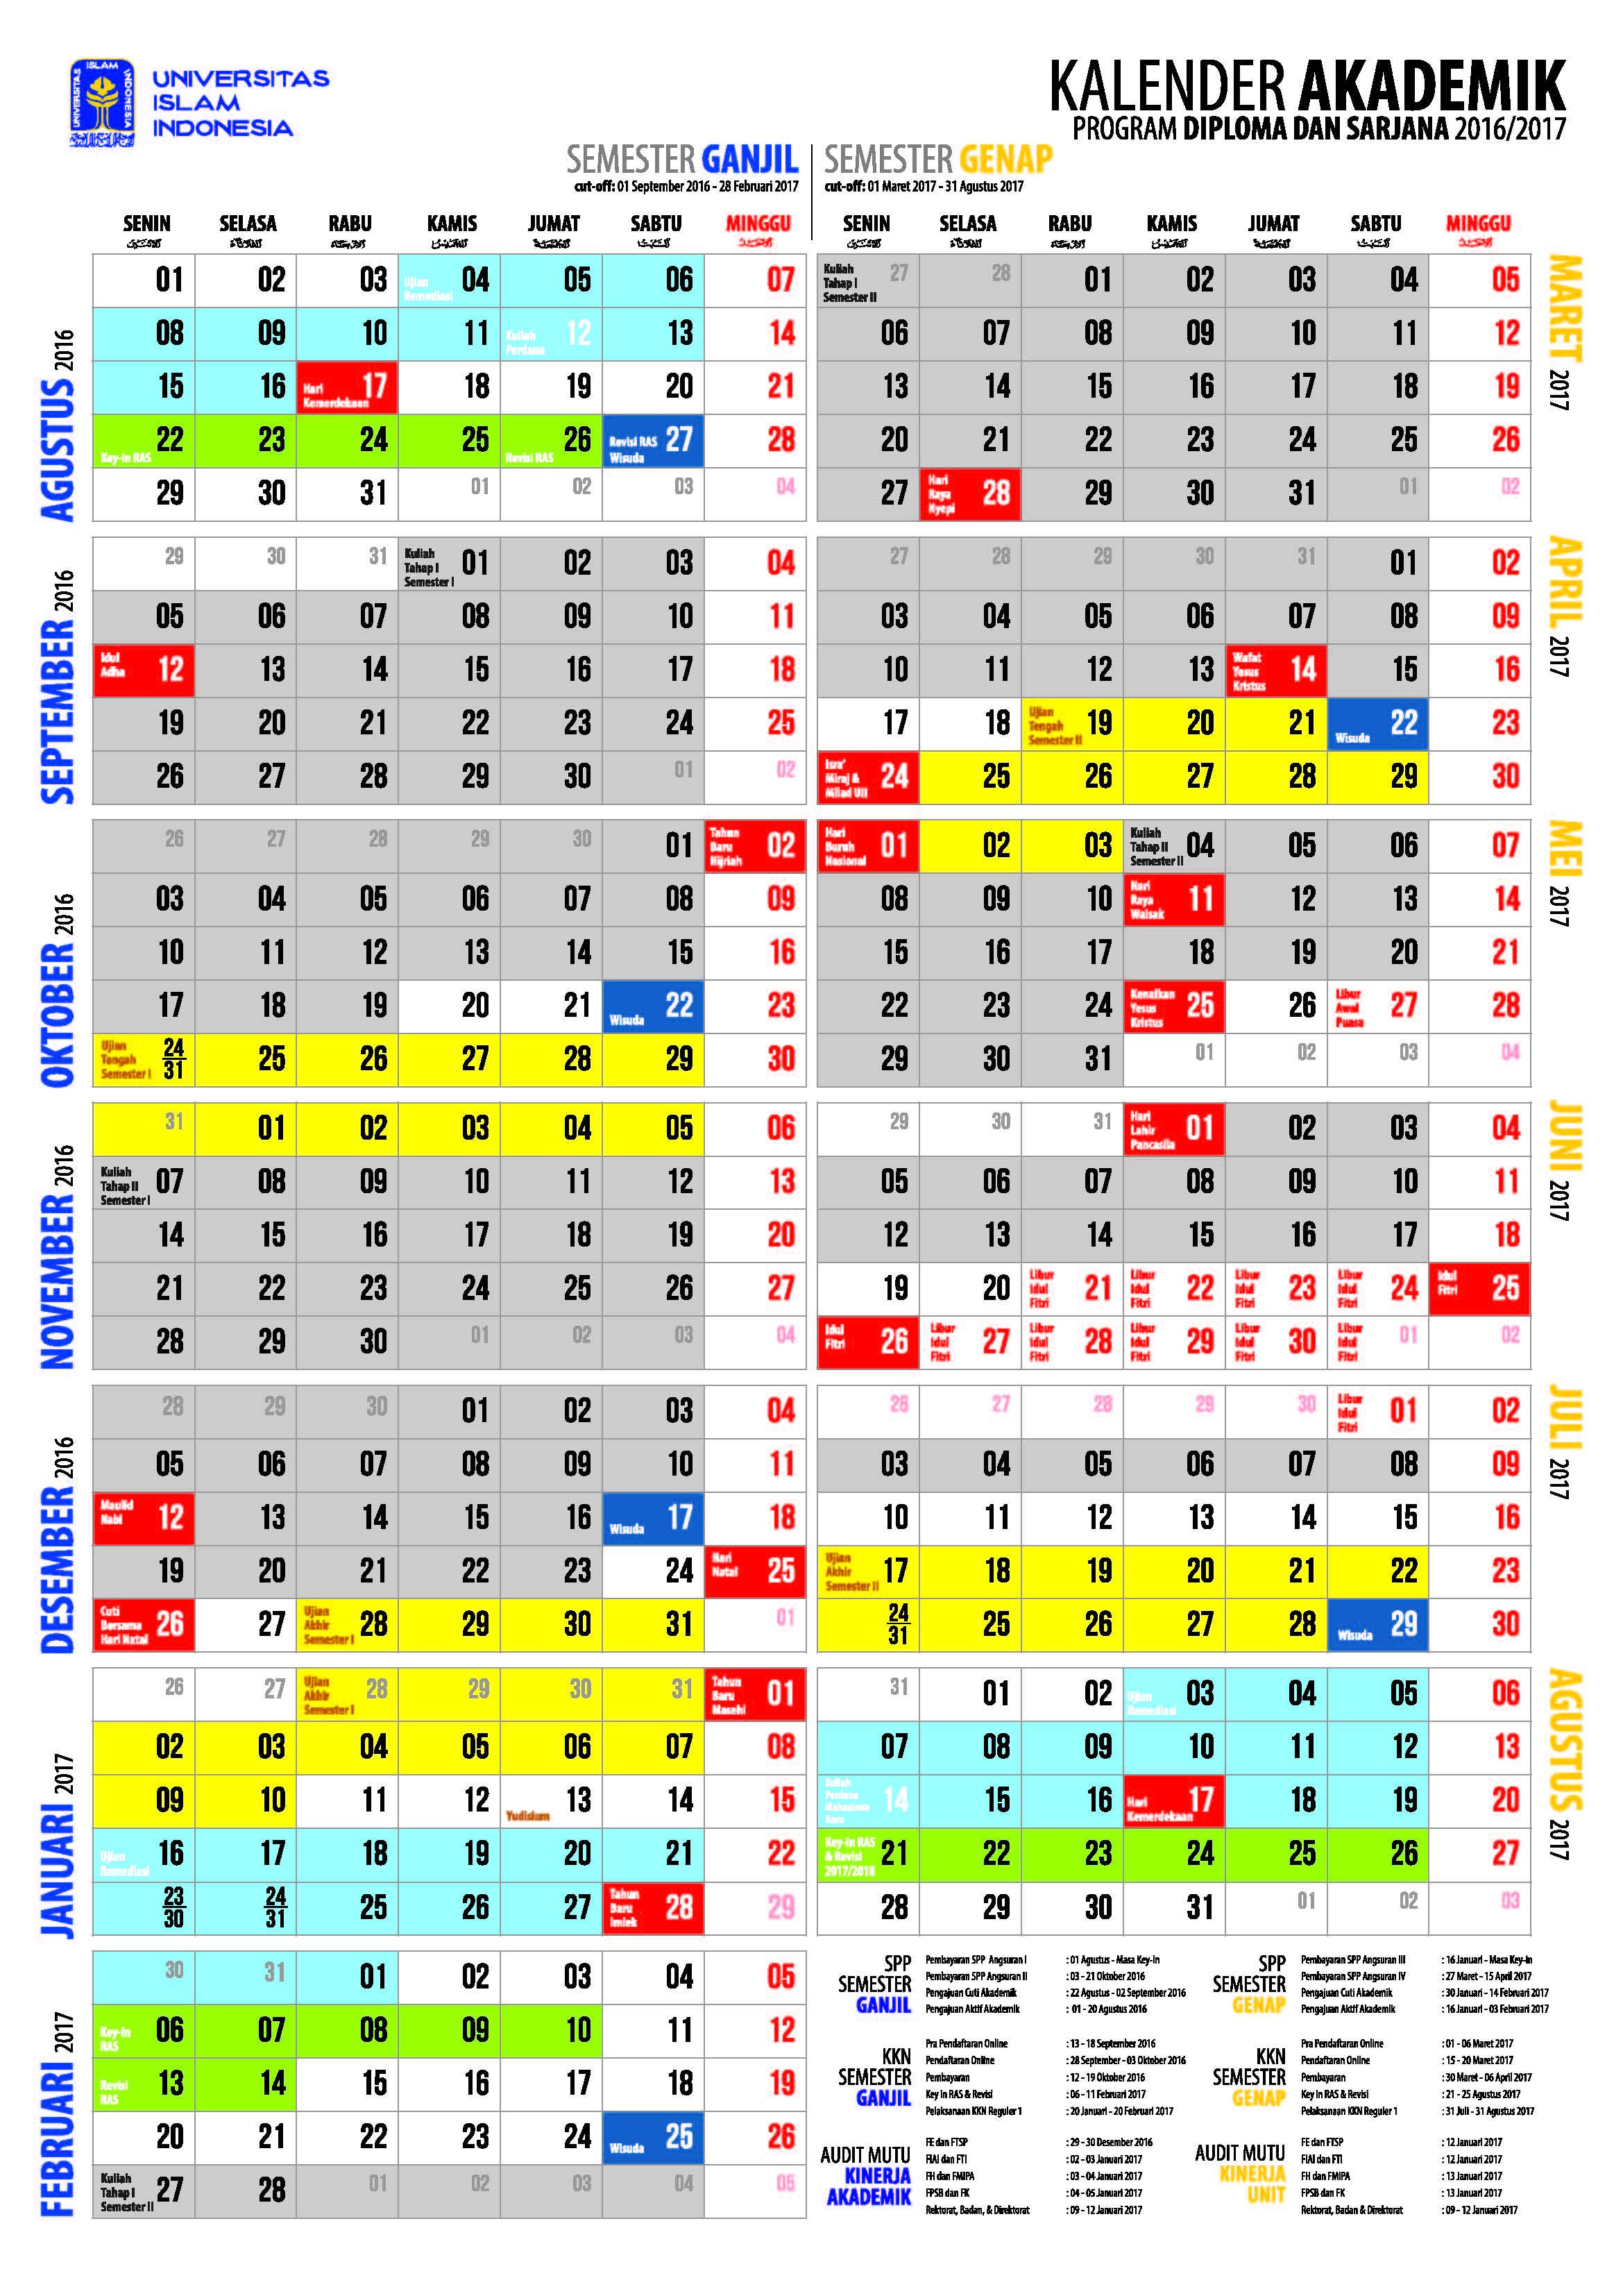 kalender akademik 1